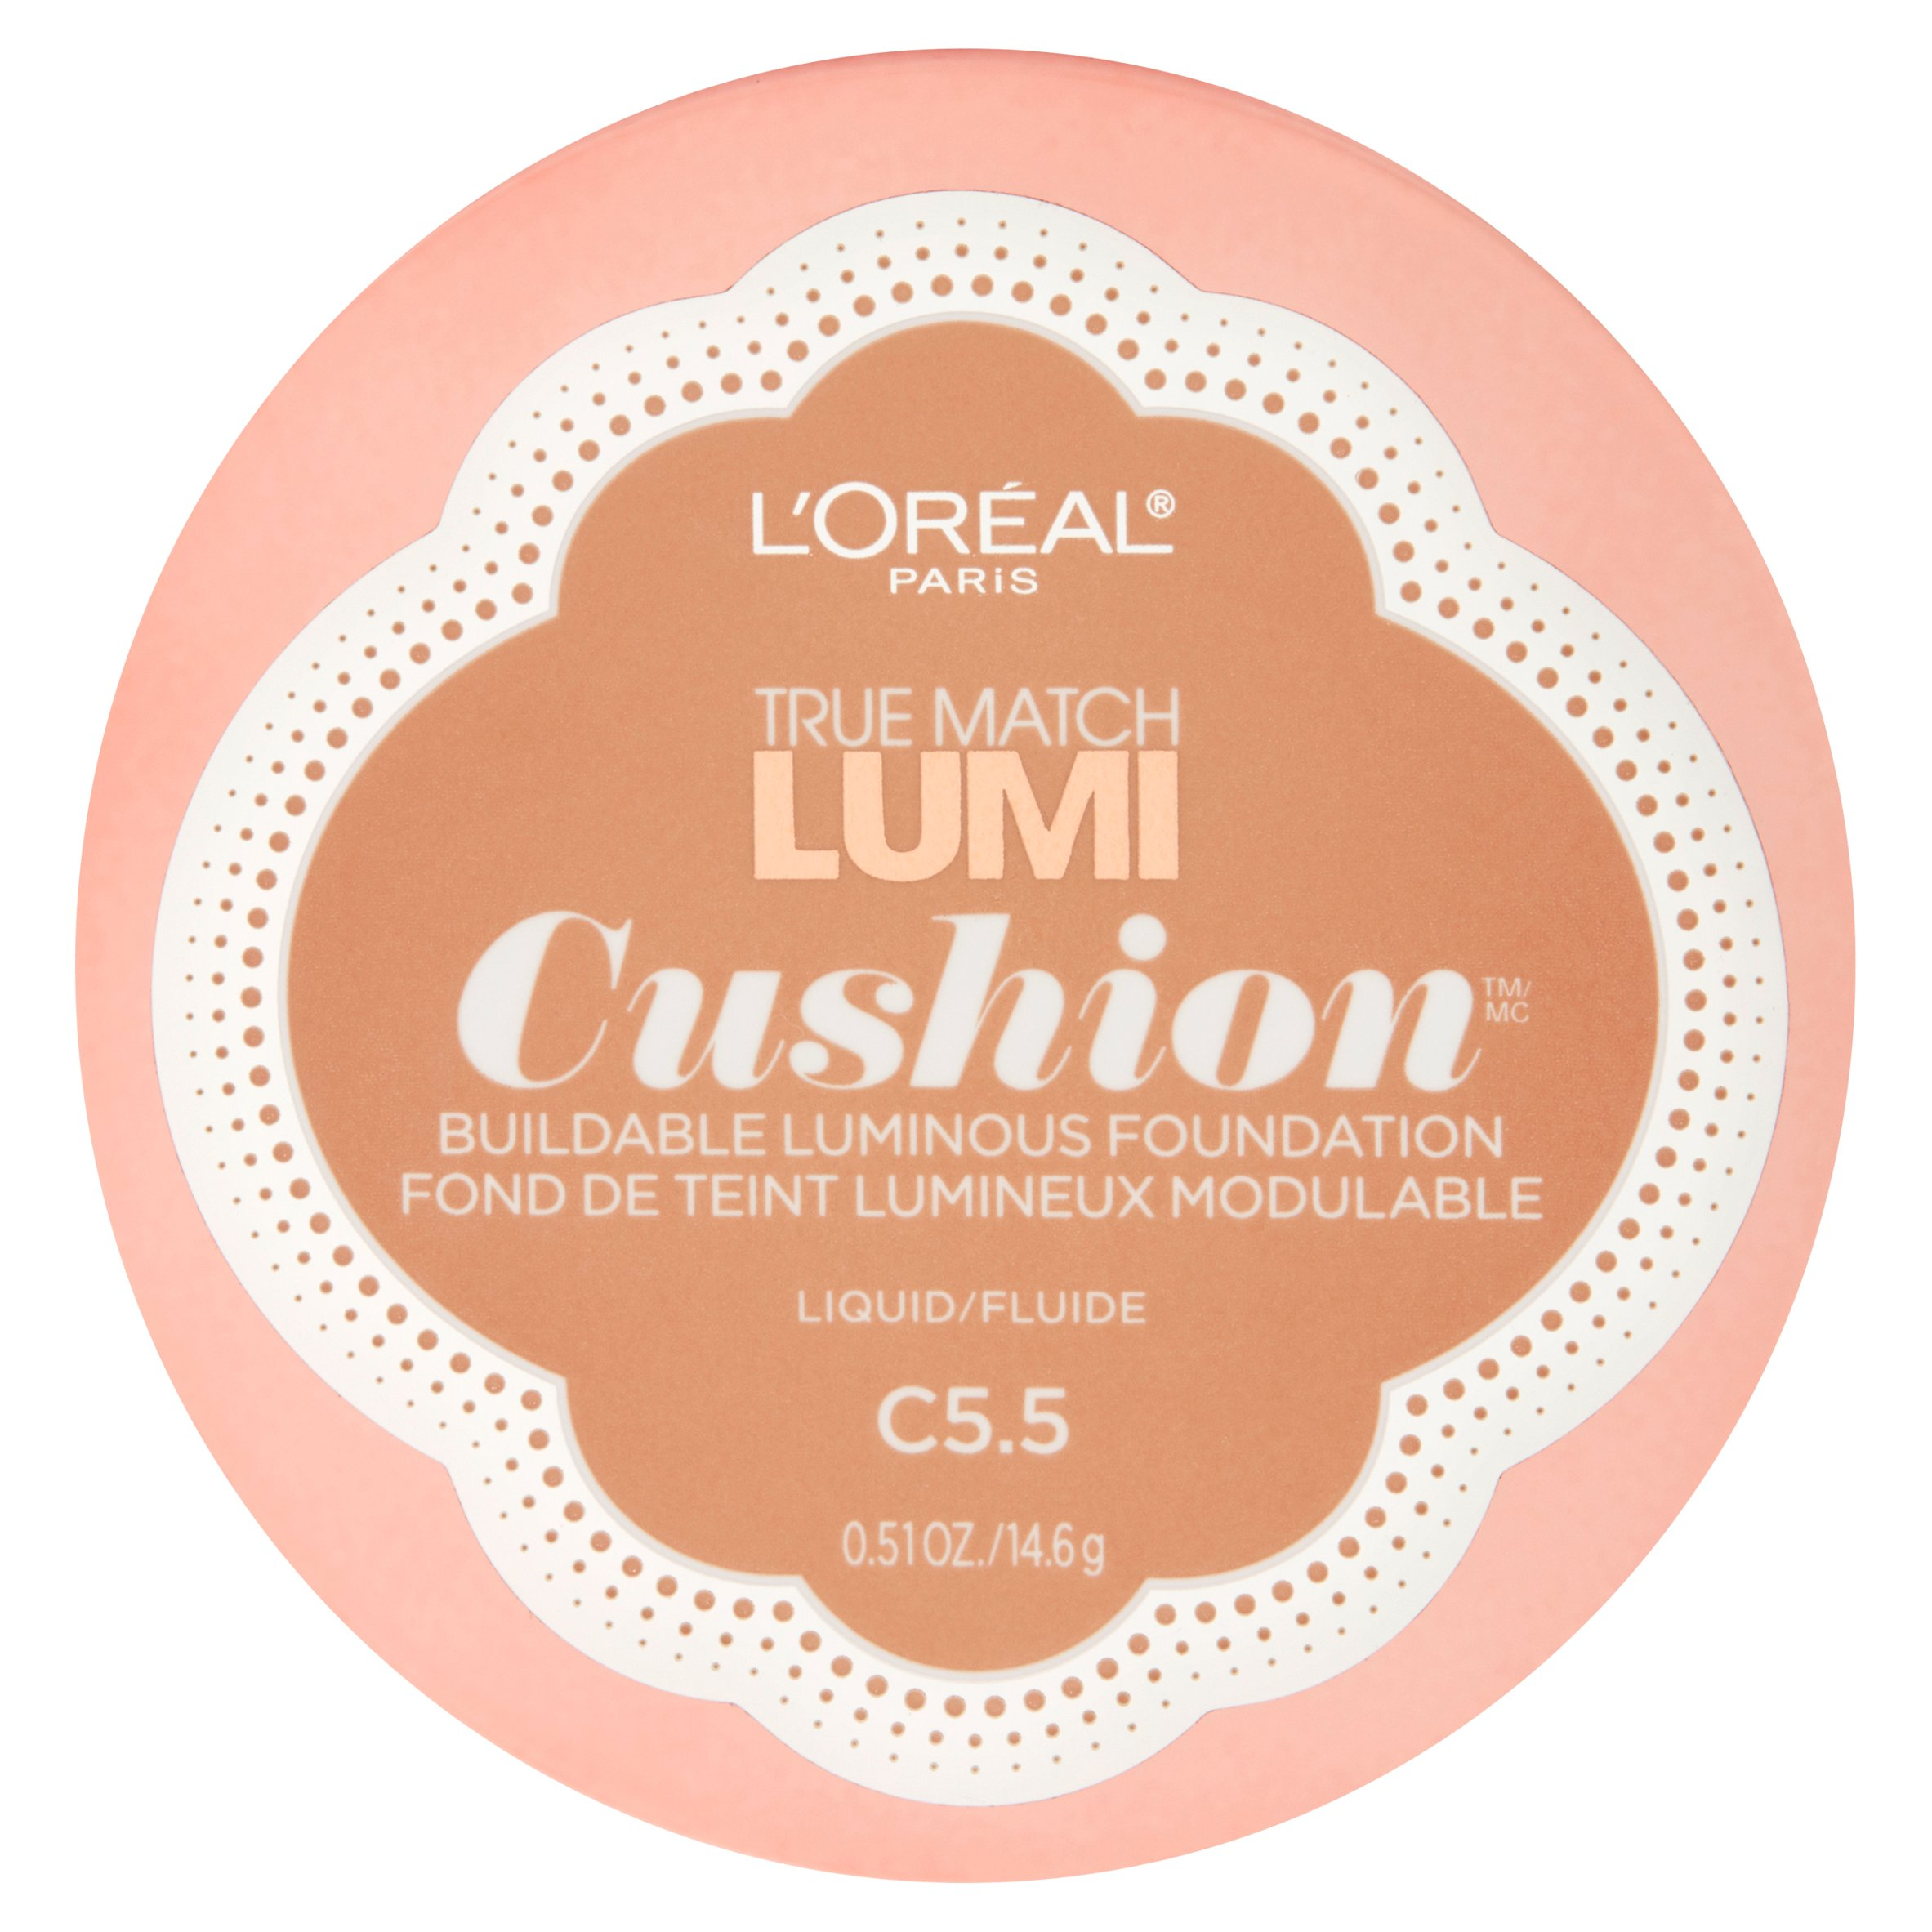 L'Oreal Paris True Match Lumi Cushion Foundation